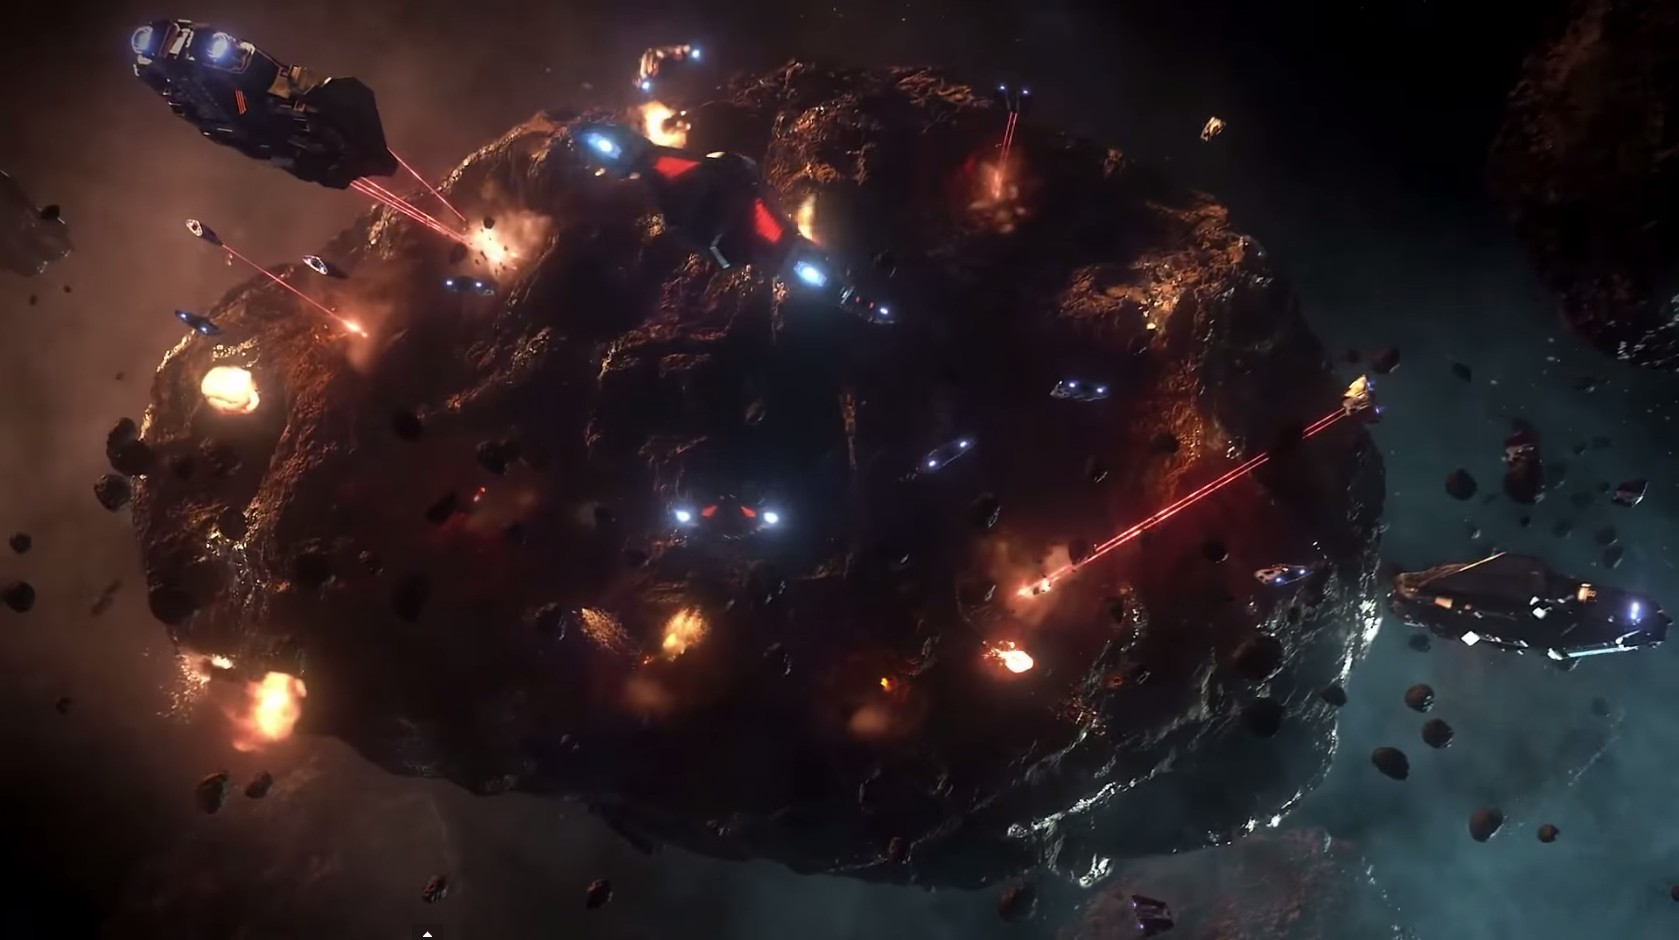 spacecraft computer game - photo #47